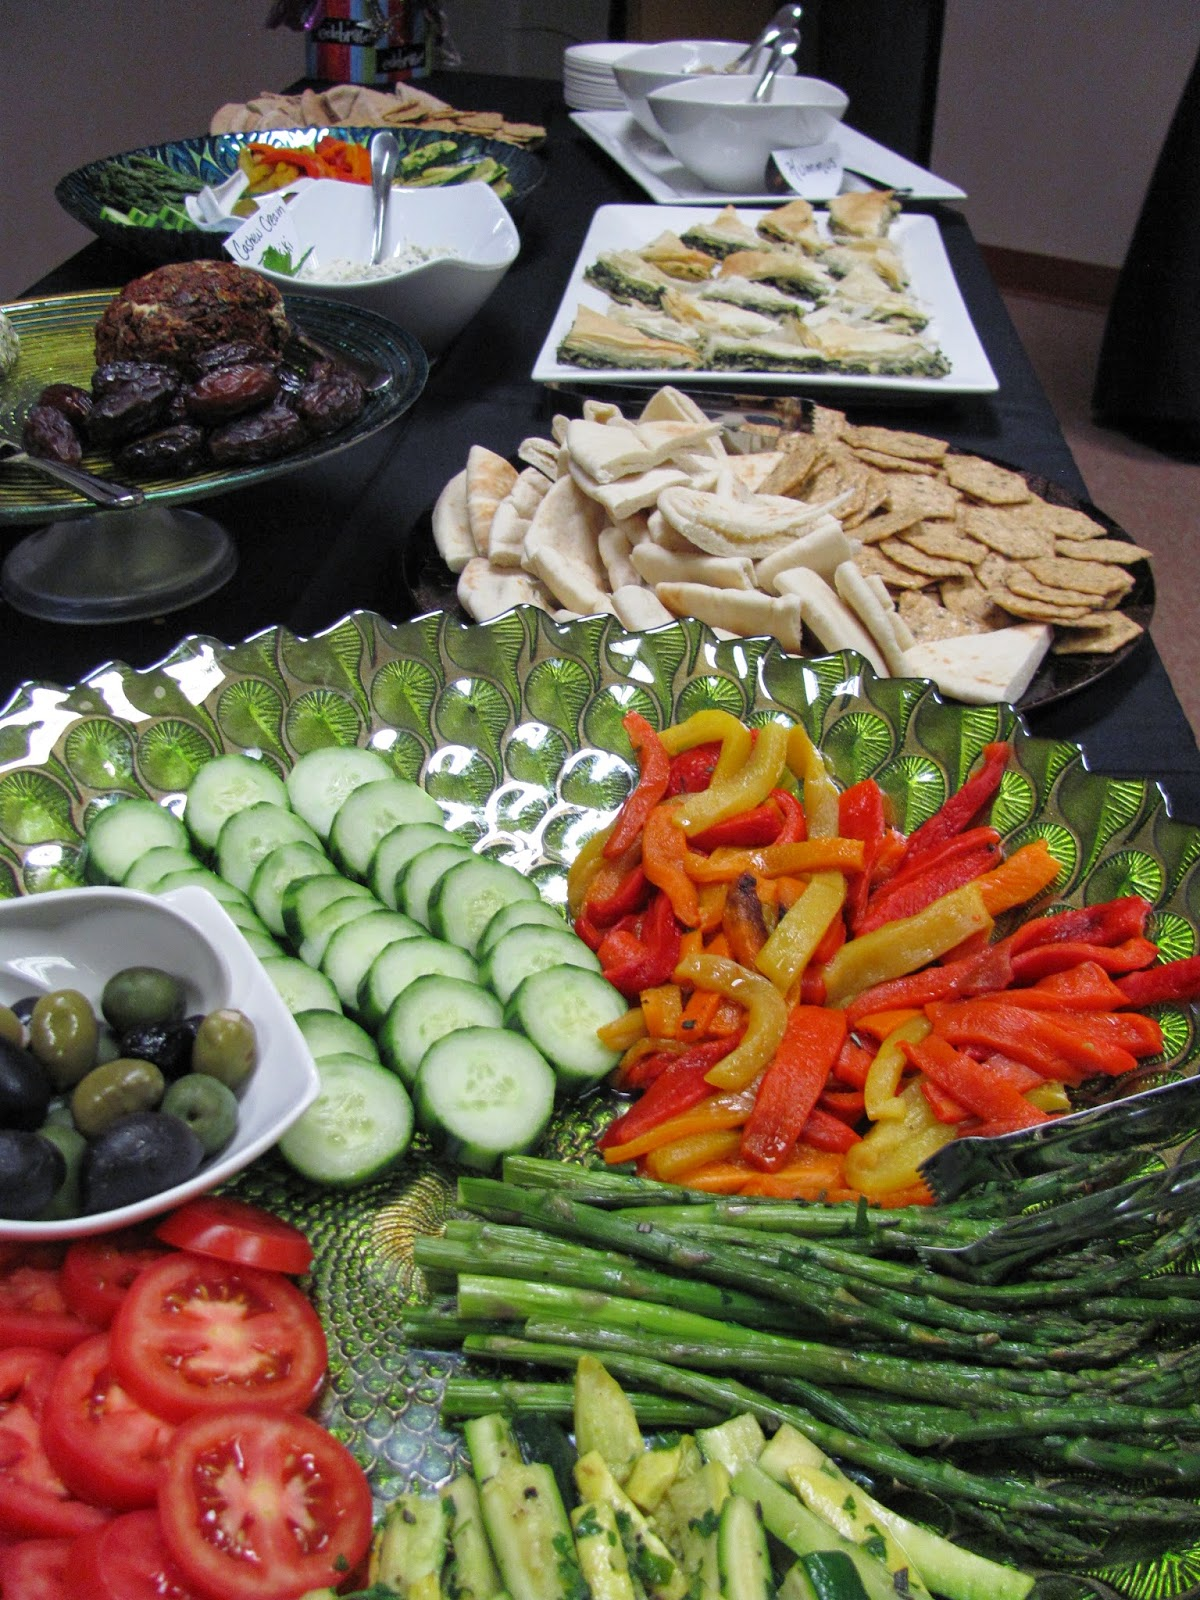 Mediterranean Antipasti and Mezze Platters